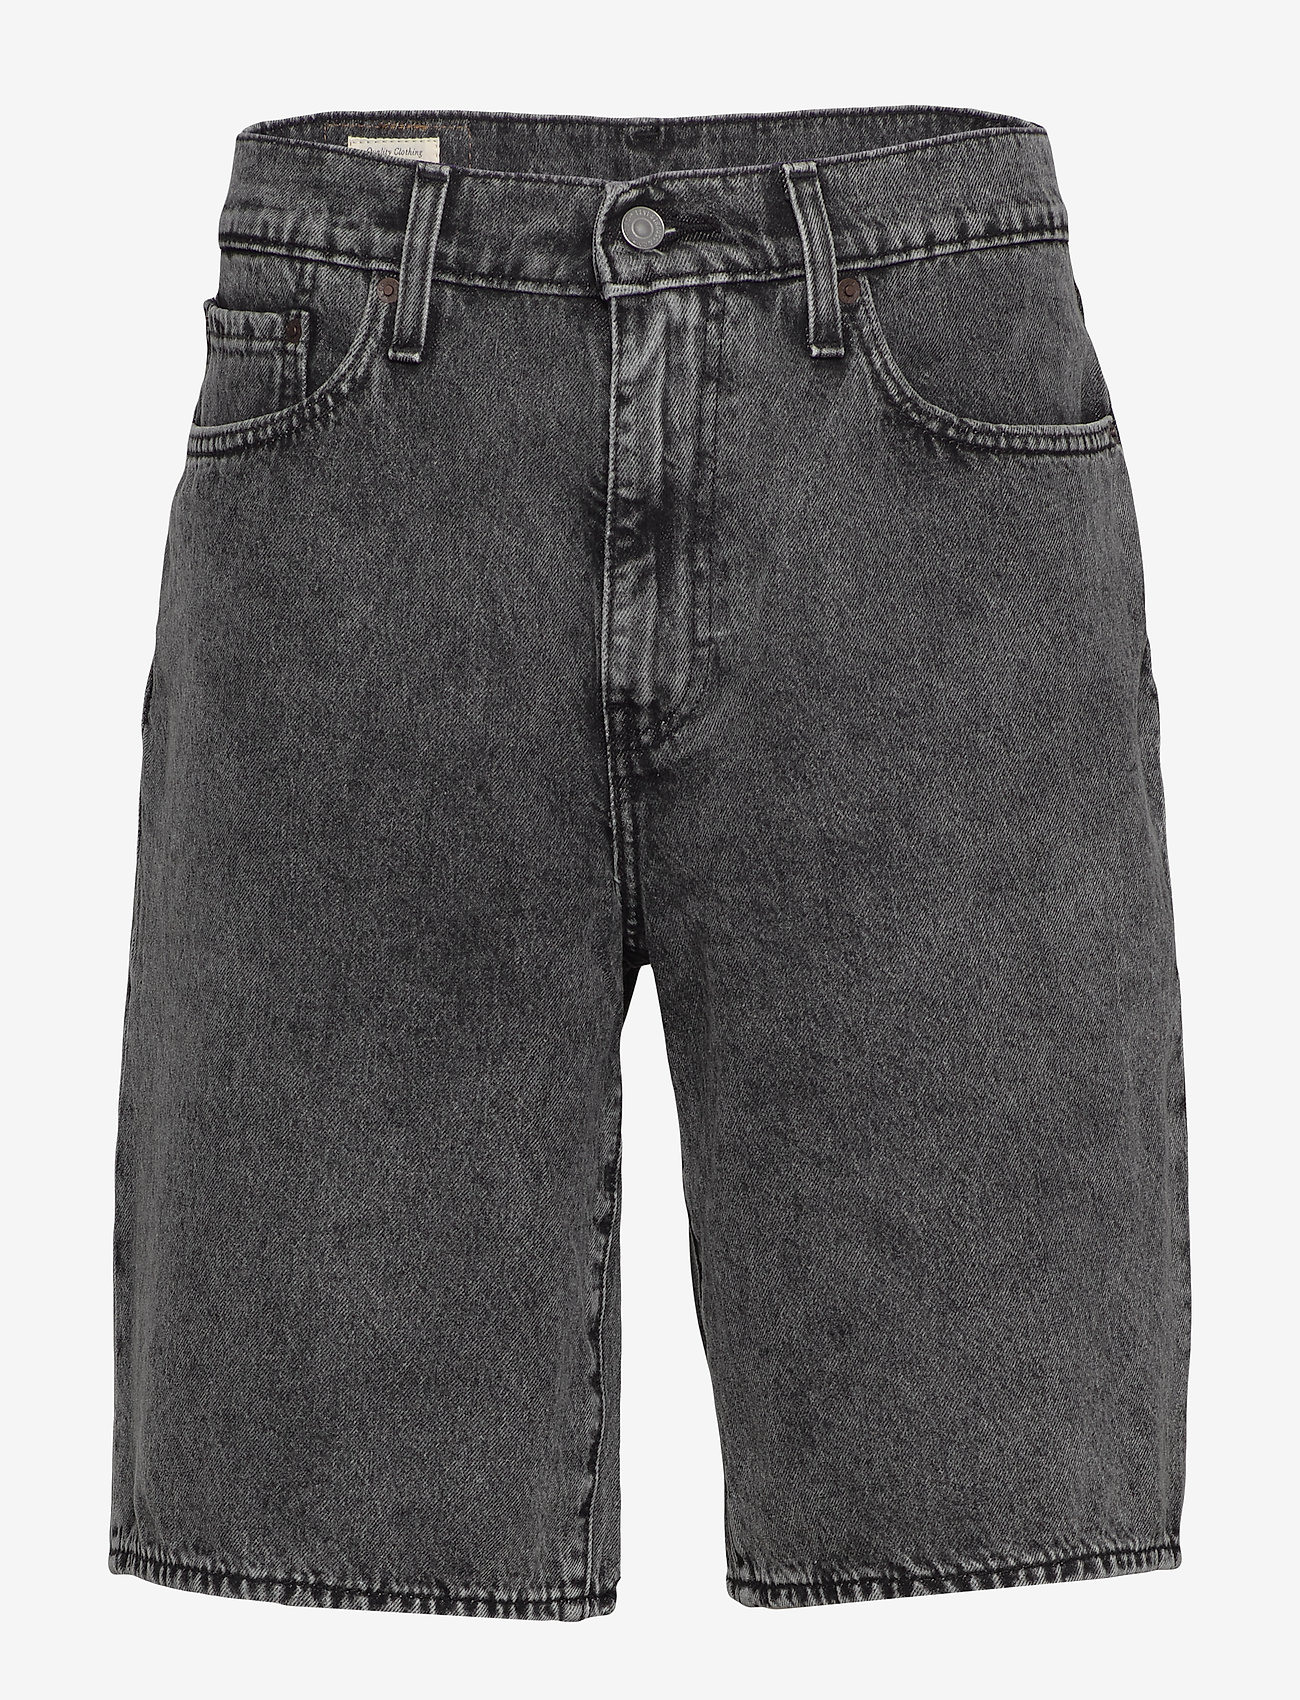 LEVI´S Men - HALF PANTS MUFFIN SHORT - denim shorts - blacks - 0